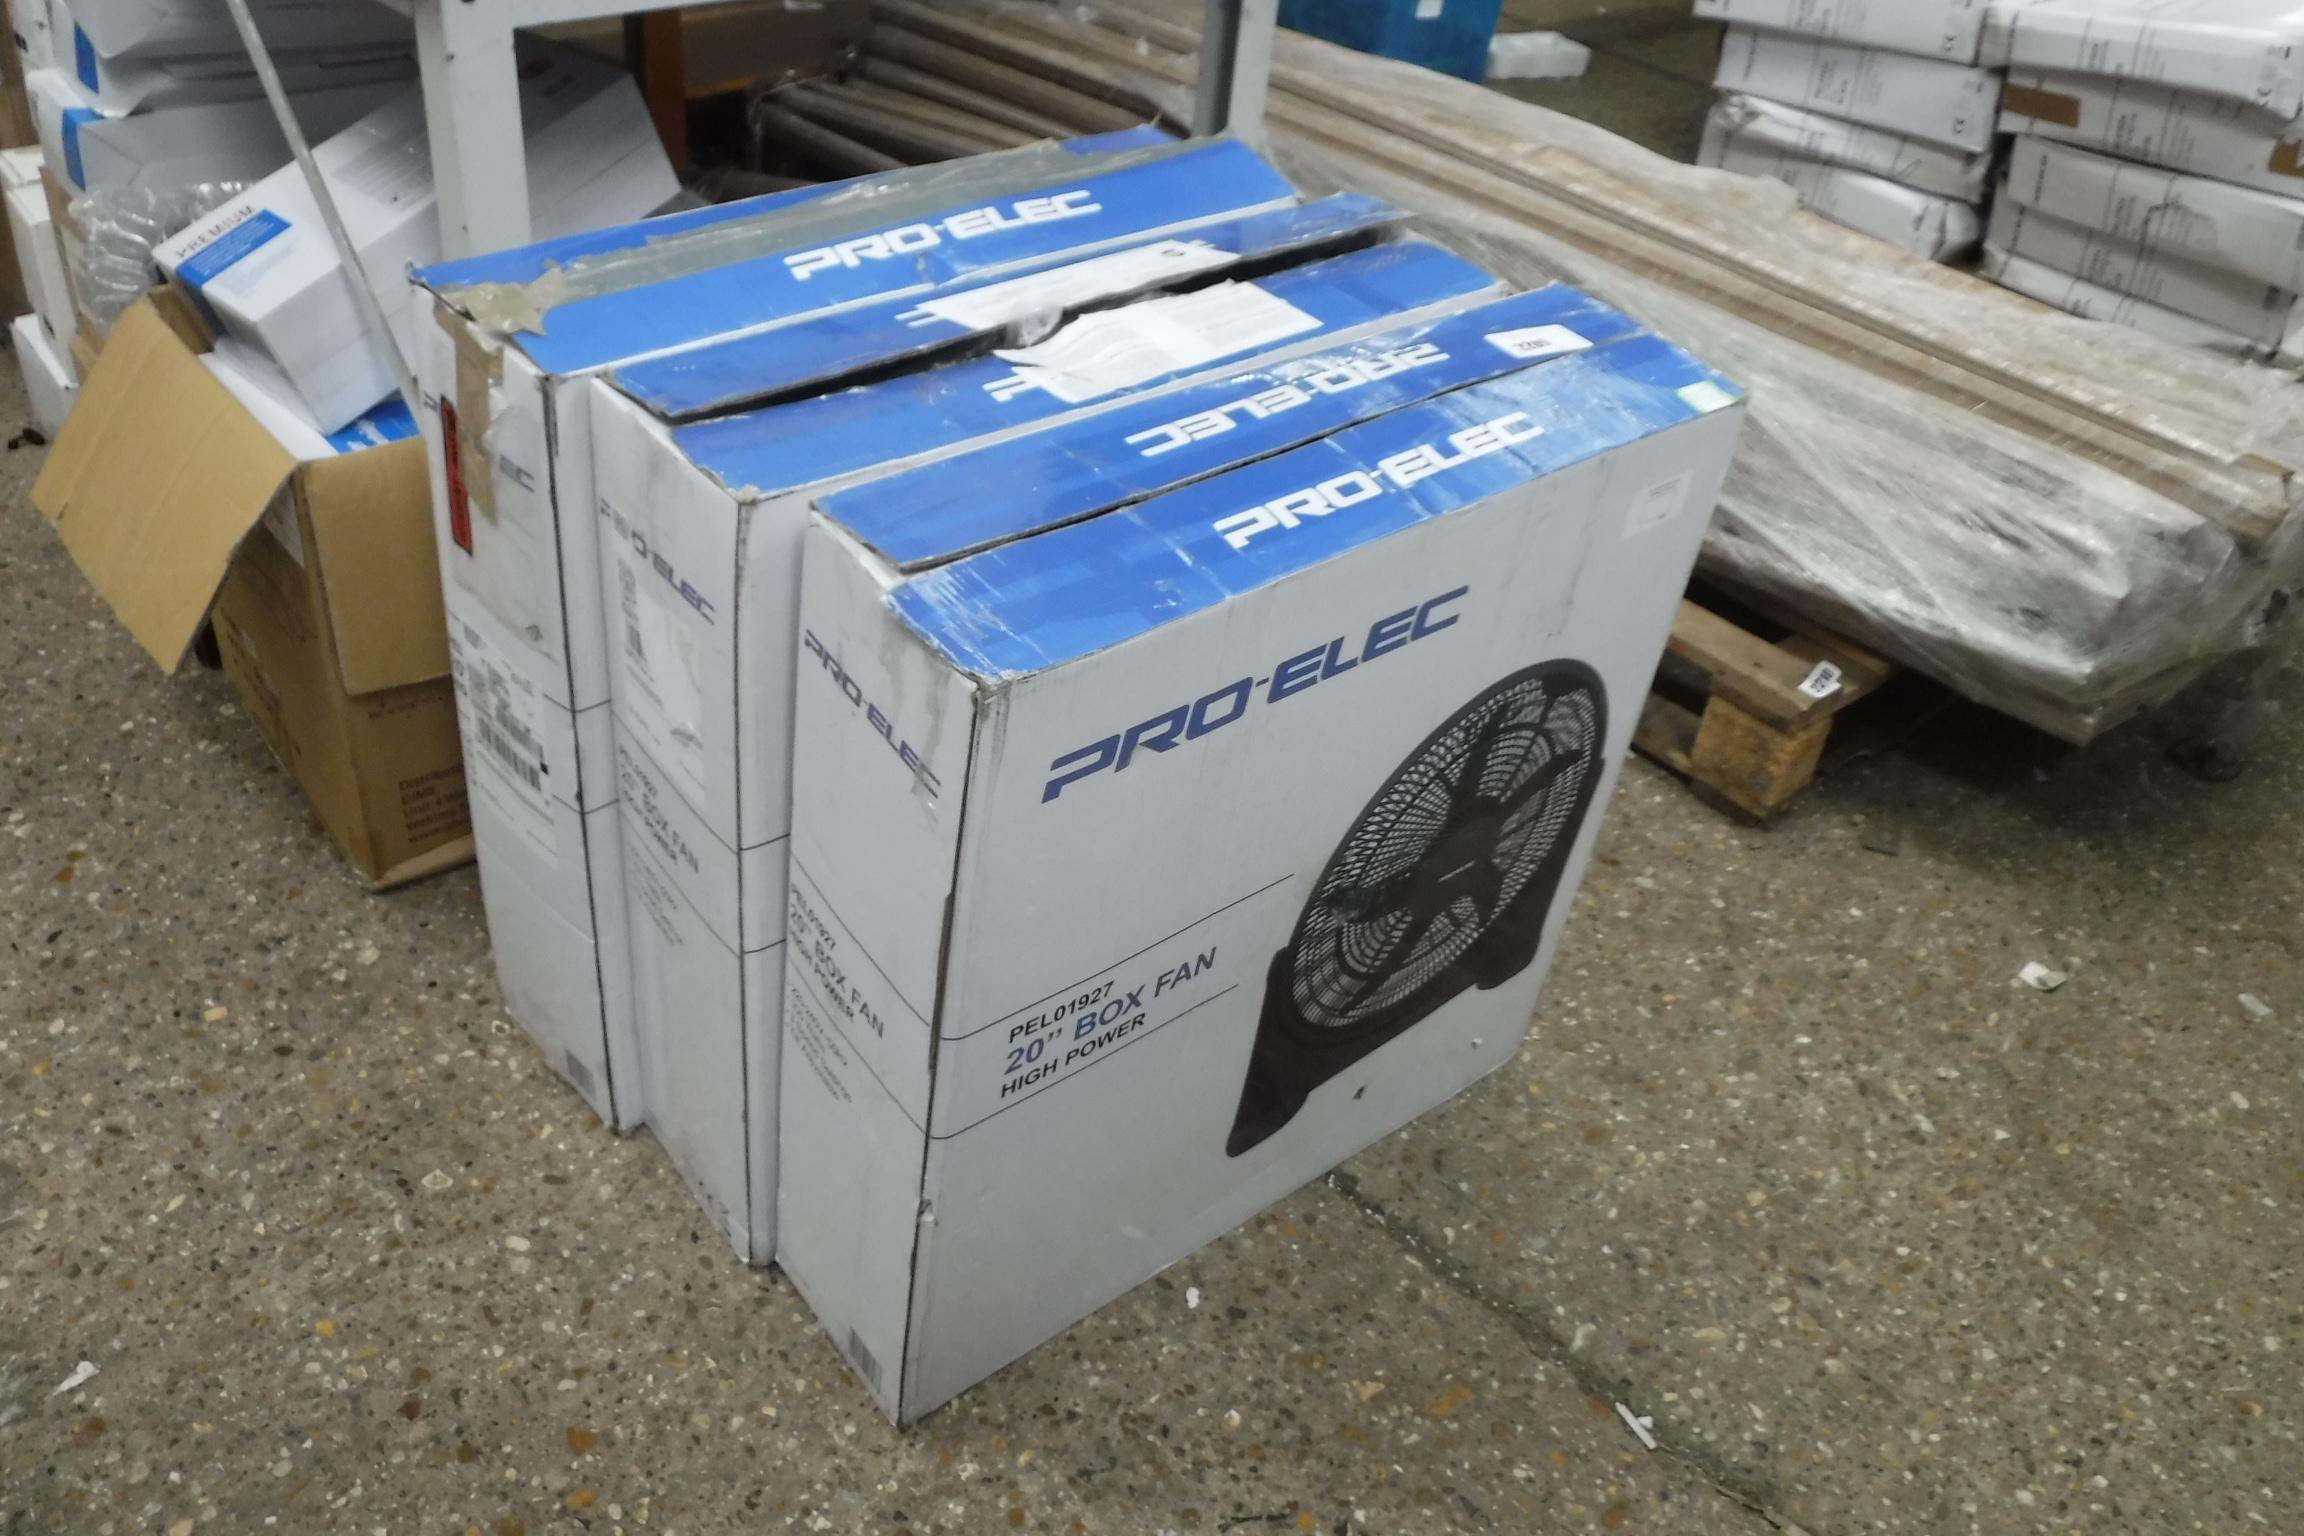 3 boxed 20'' box fans